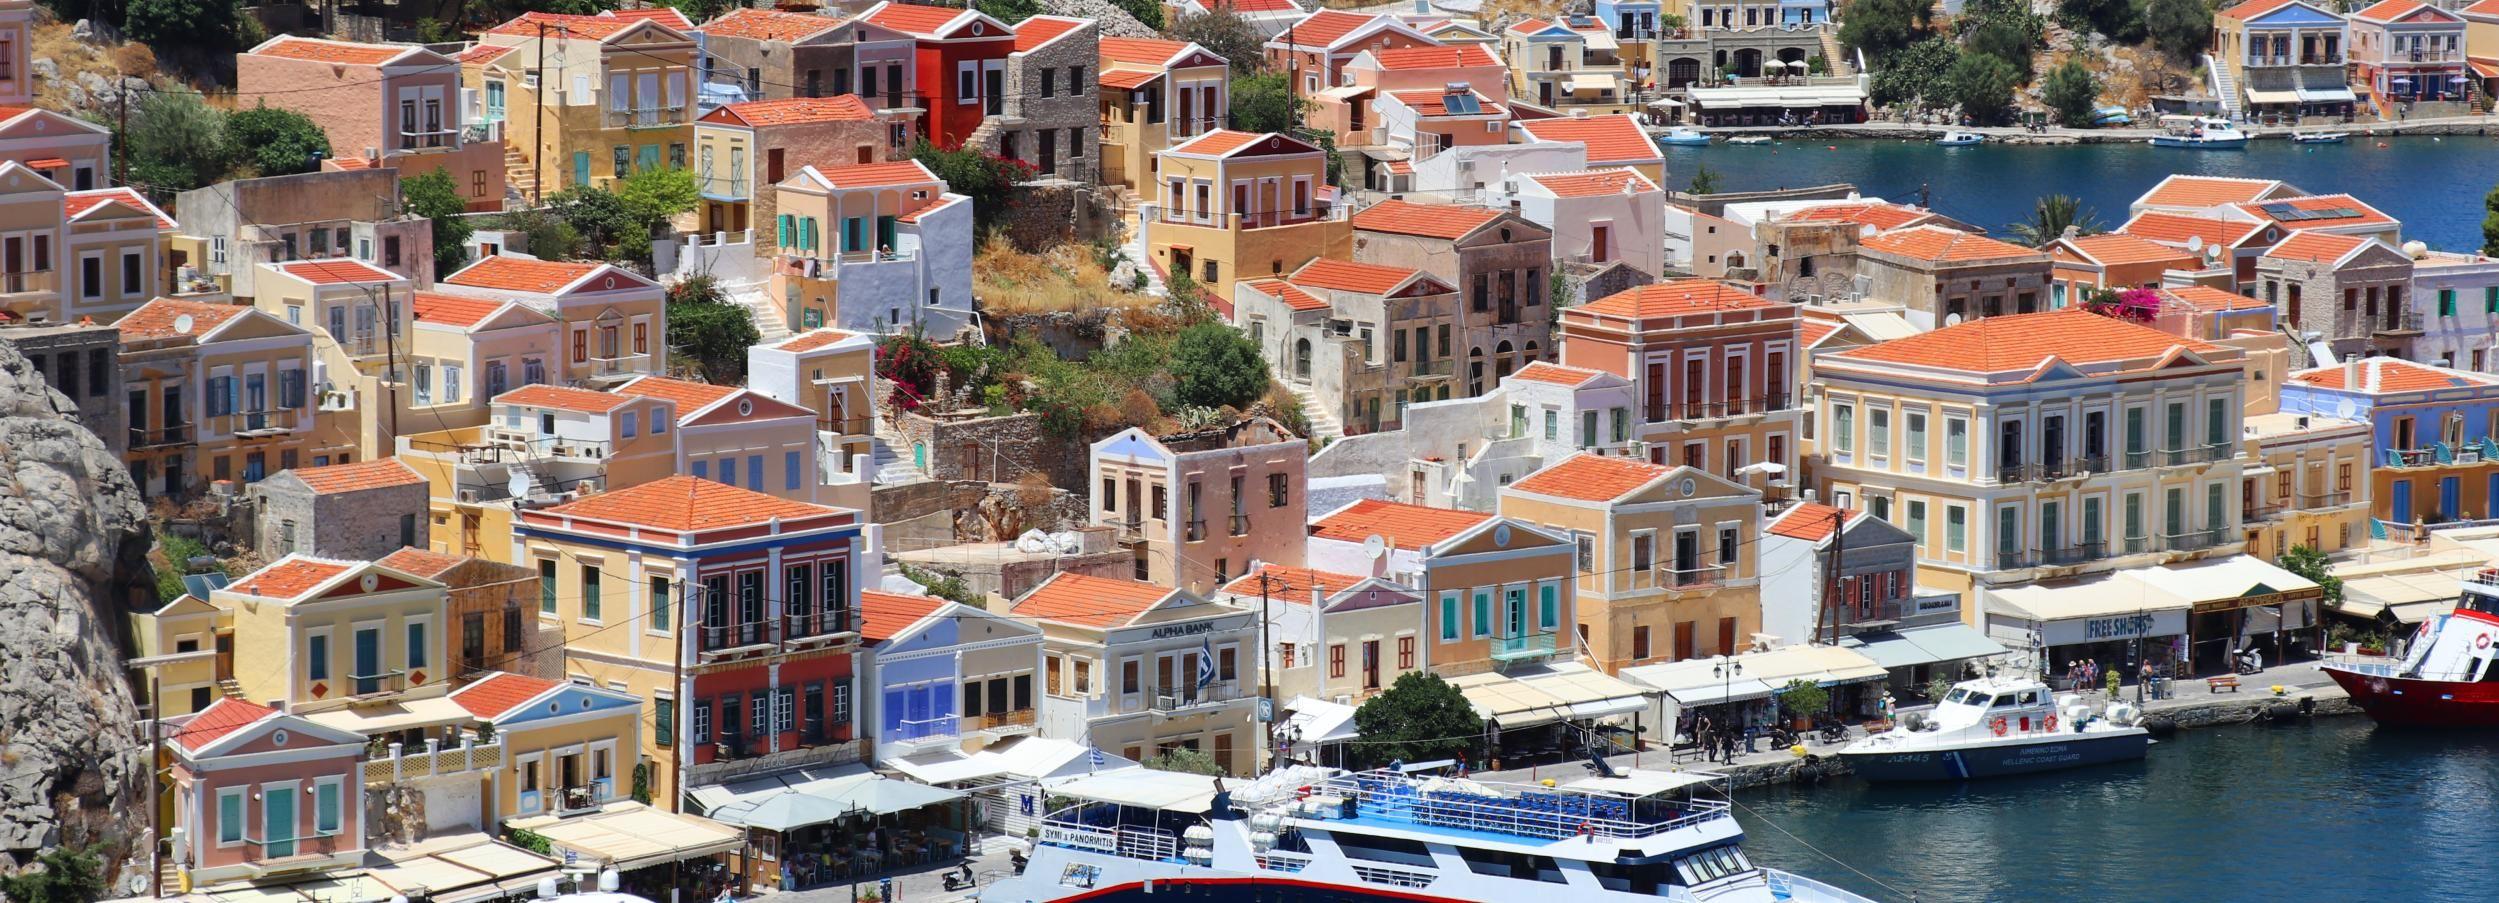 From Rhodes: Symi Island Full Day Trip by Boat